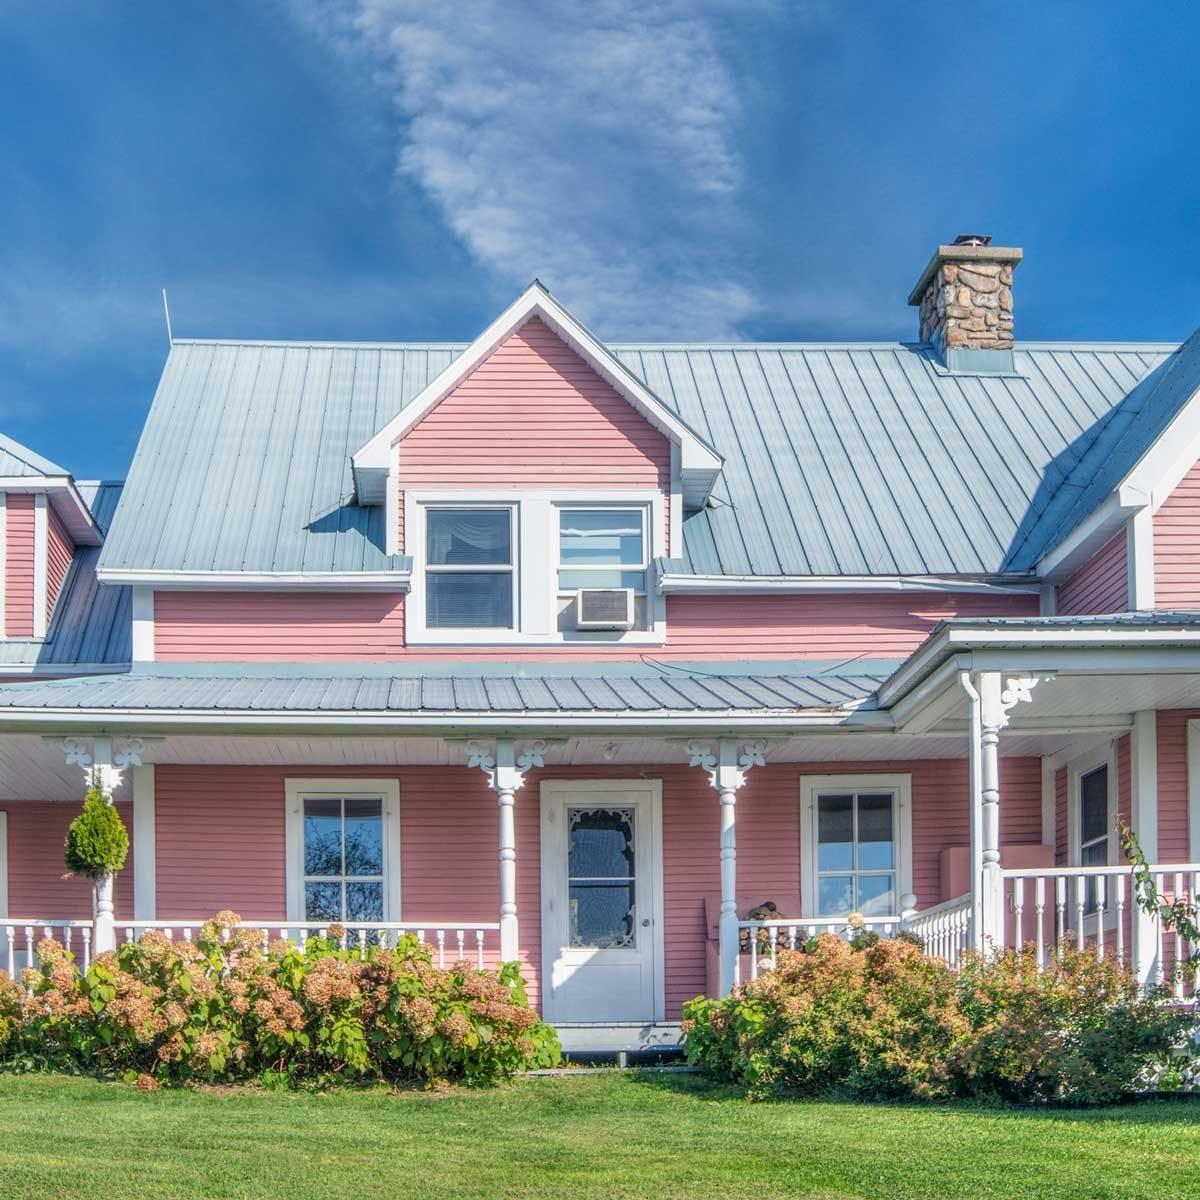 Exterior House Paint: 5 Colors That Could Devalue Your Home